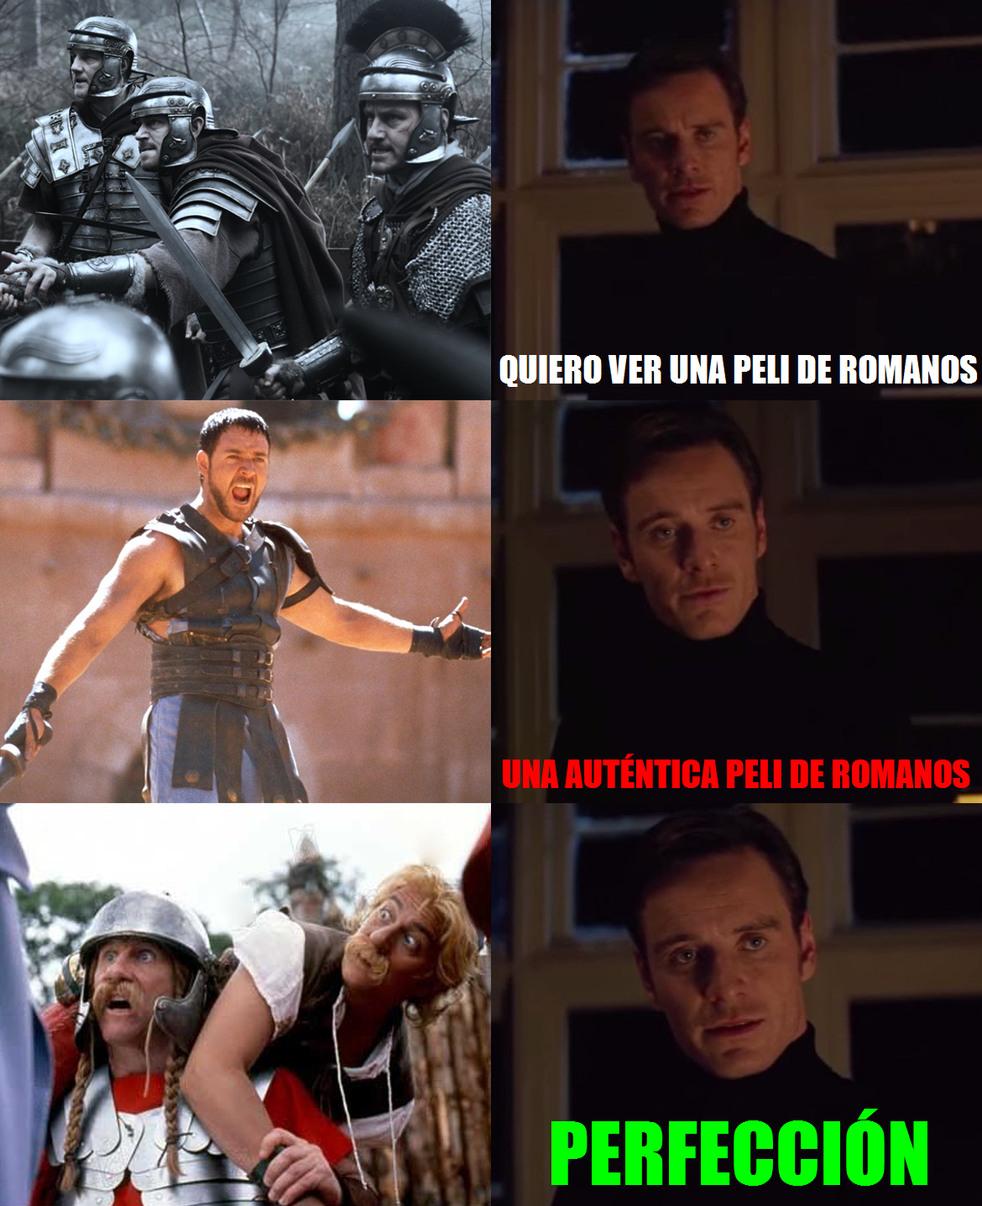 Una verdadera peli de romanos - meme